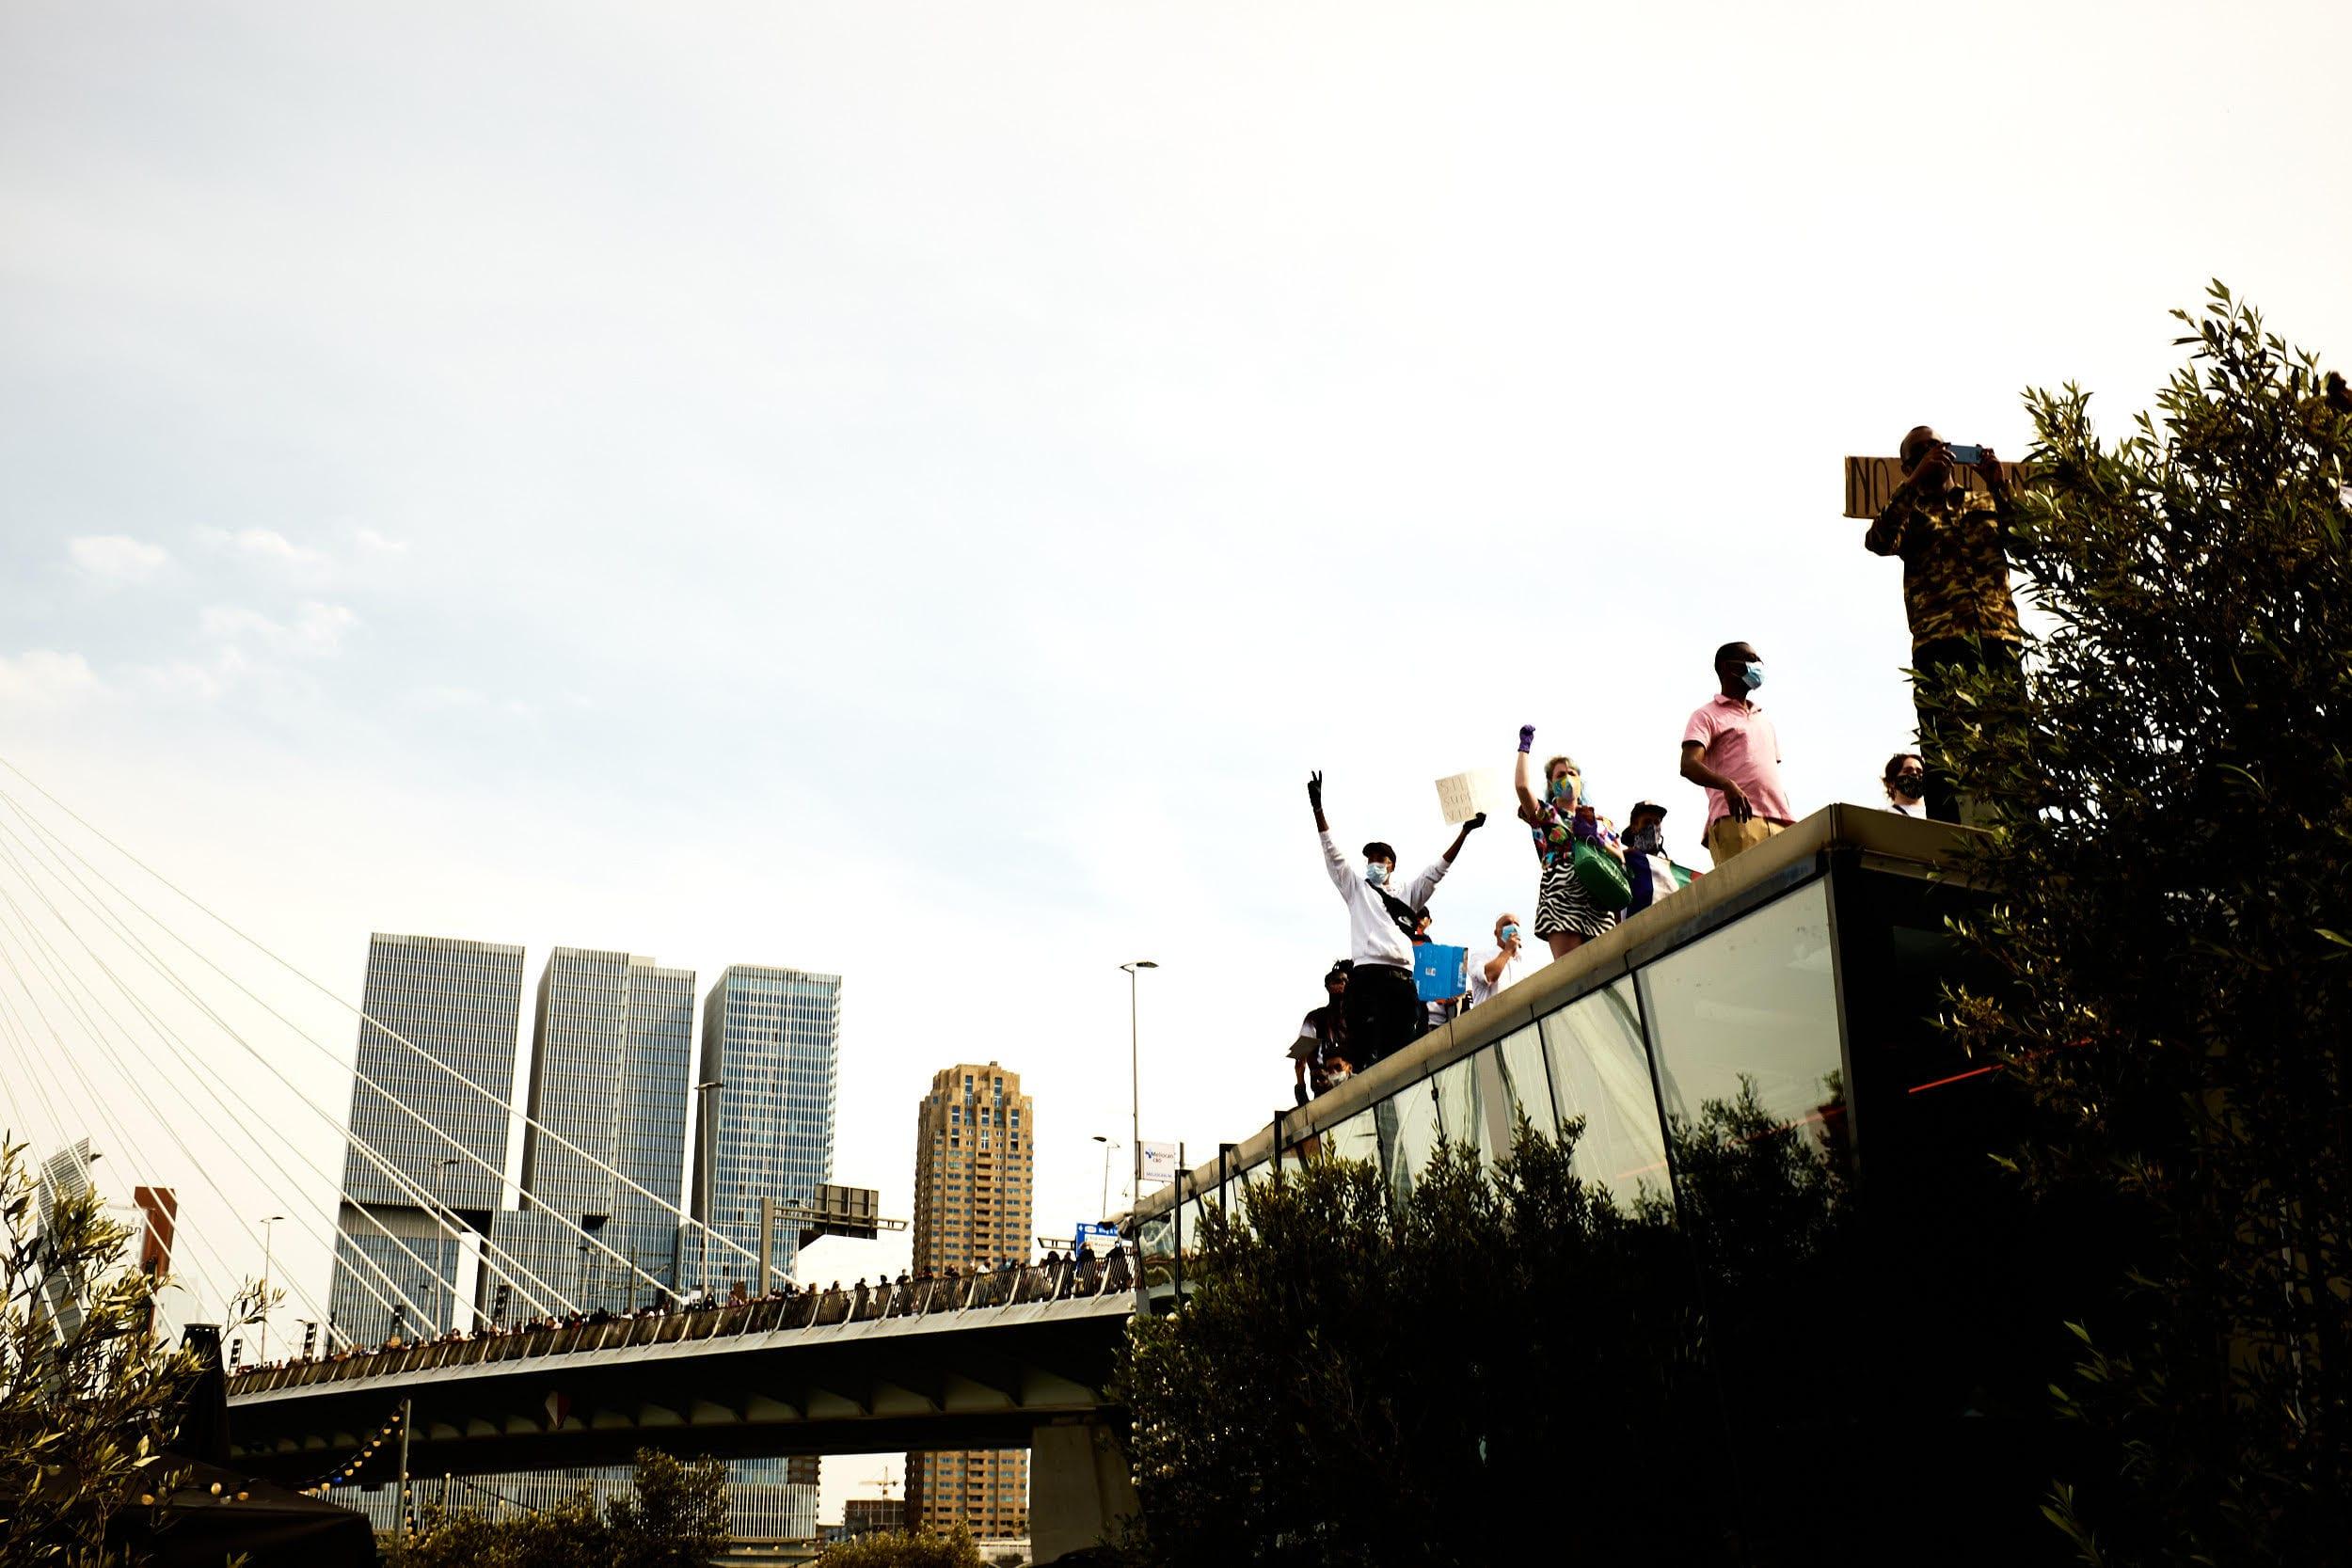 Black Lives Matter demonstratie in Rotterdam. Foto: Willem de Kam